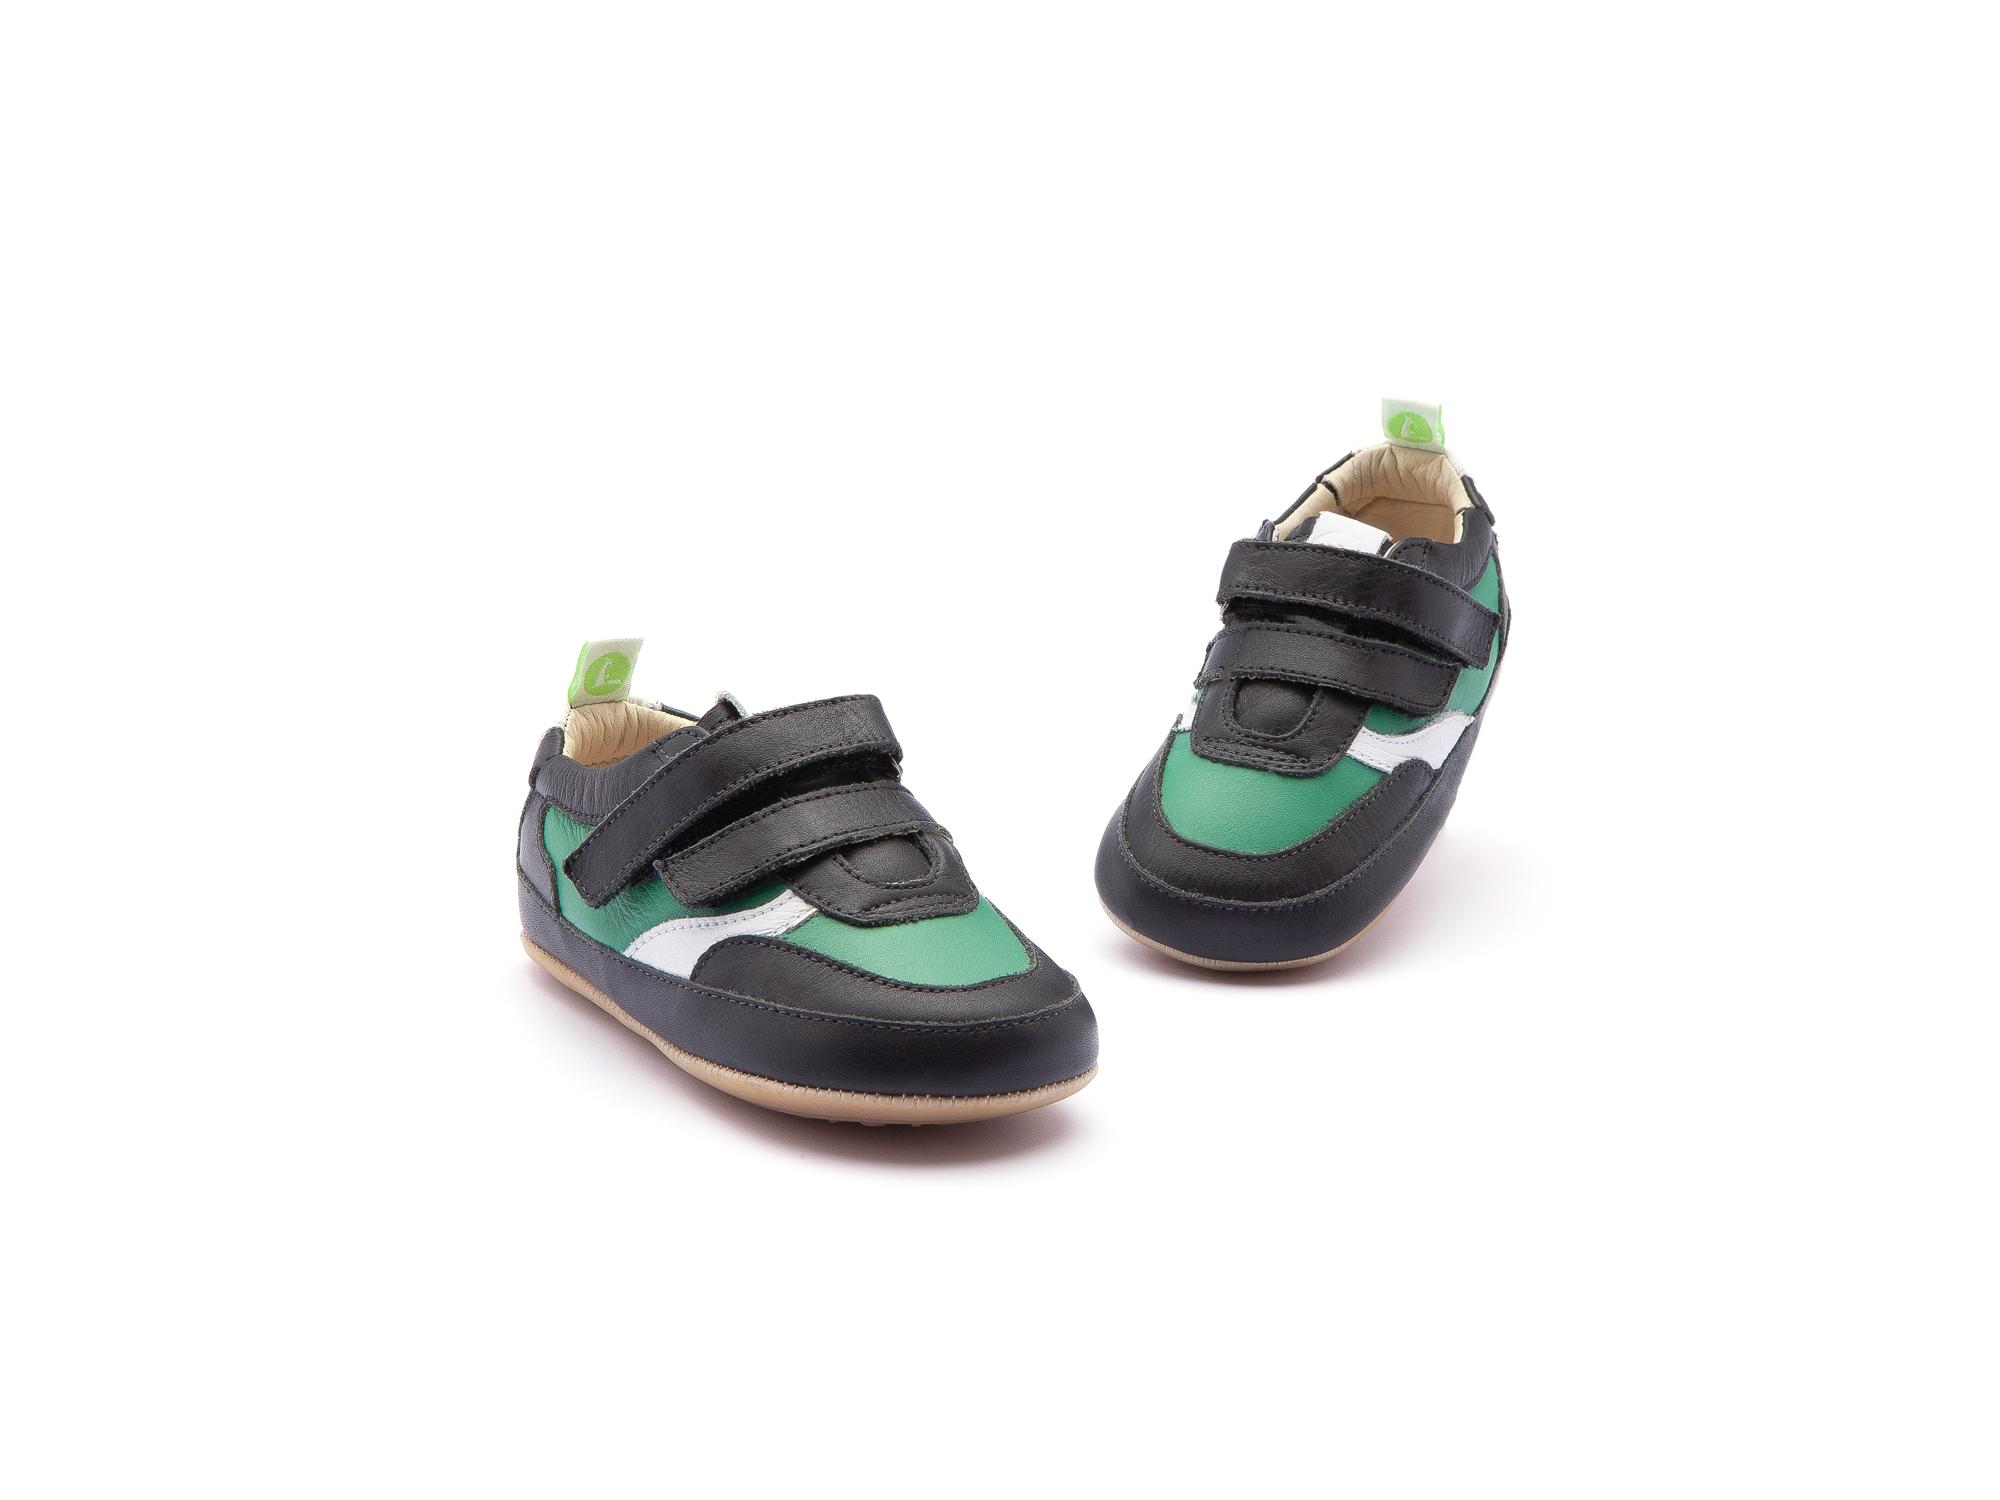 Tênis Streety Black/ Green Leaf Baby 0 à 2 anos - 3